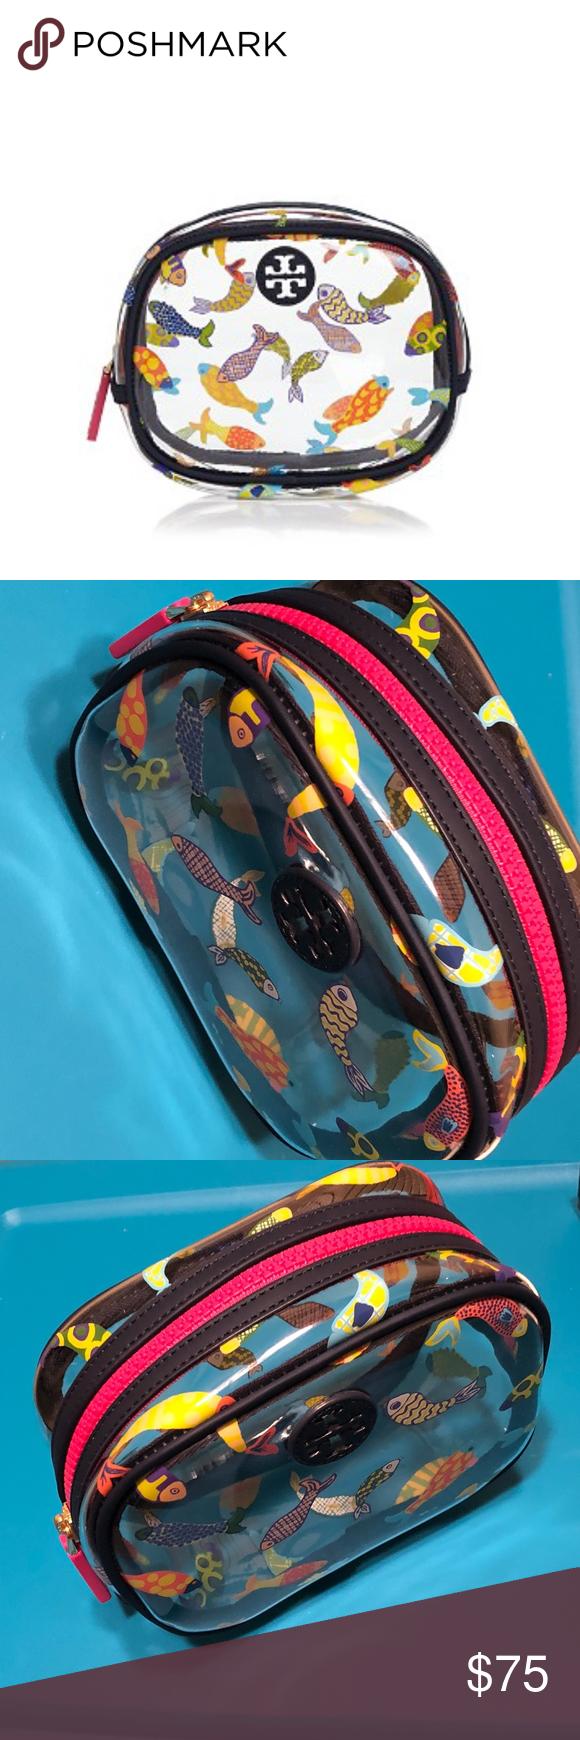 0e2539f0965f NWT! TORY BURCH Fish-Print Cosmetic Bag NWT  amp  100% AUTHENTIC!